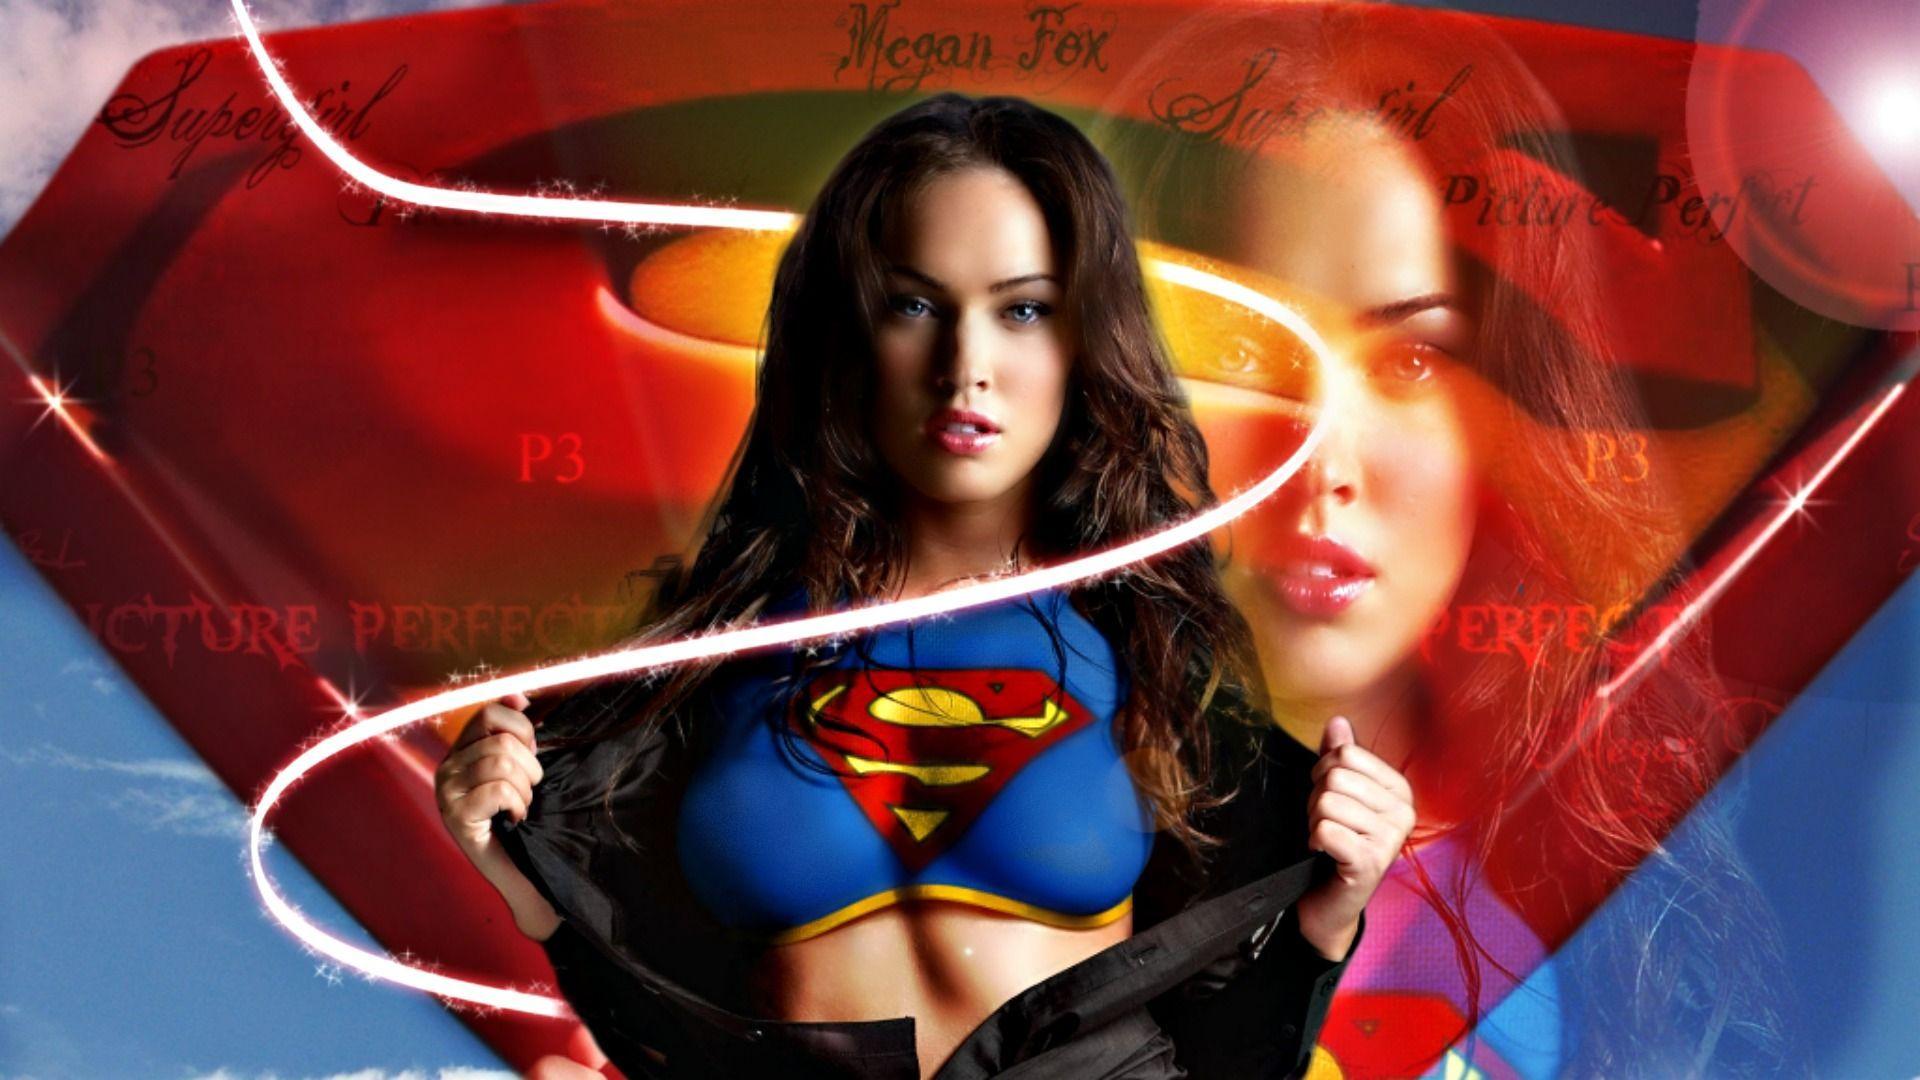 Megan Fox Supergirl Wallpapers - WallpaperPulse